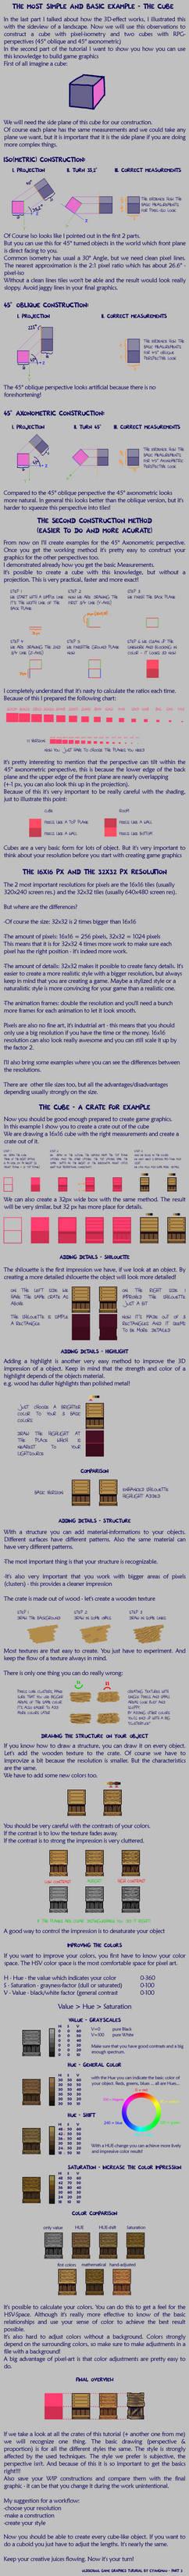 Pixel Art Tutorial 3 - The 'perfect' crate